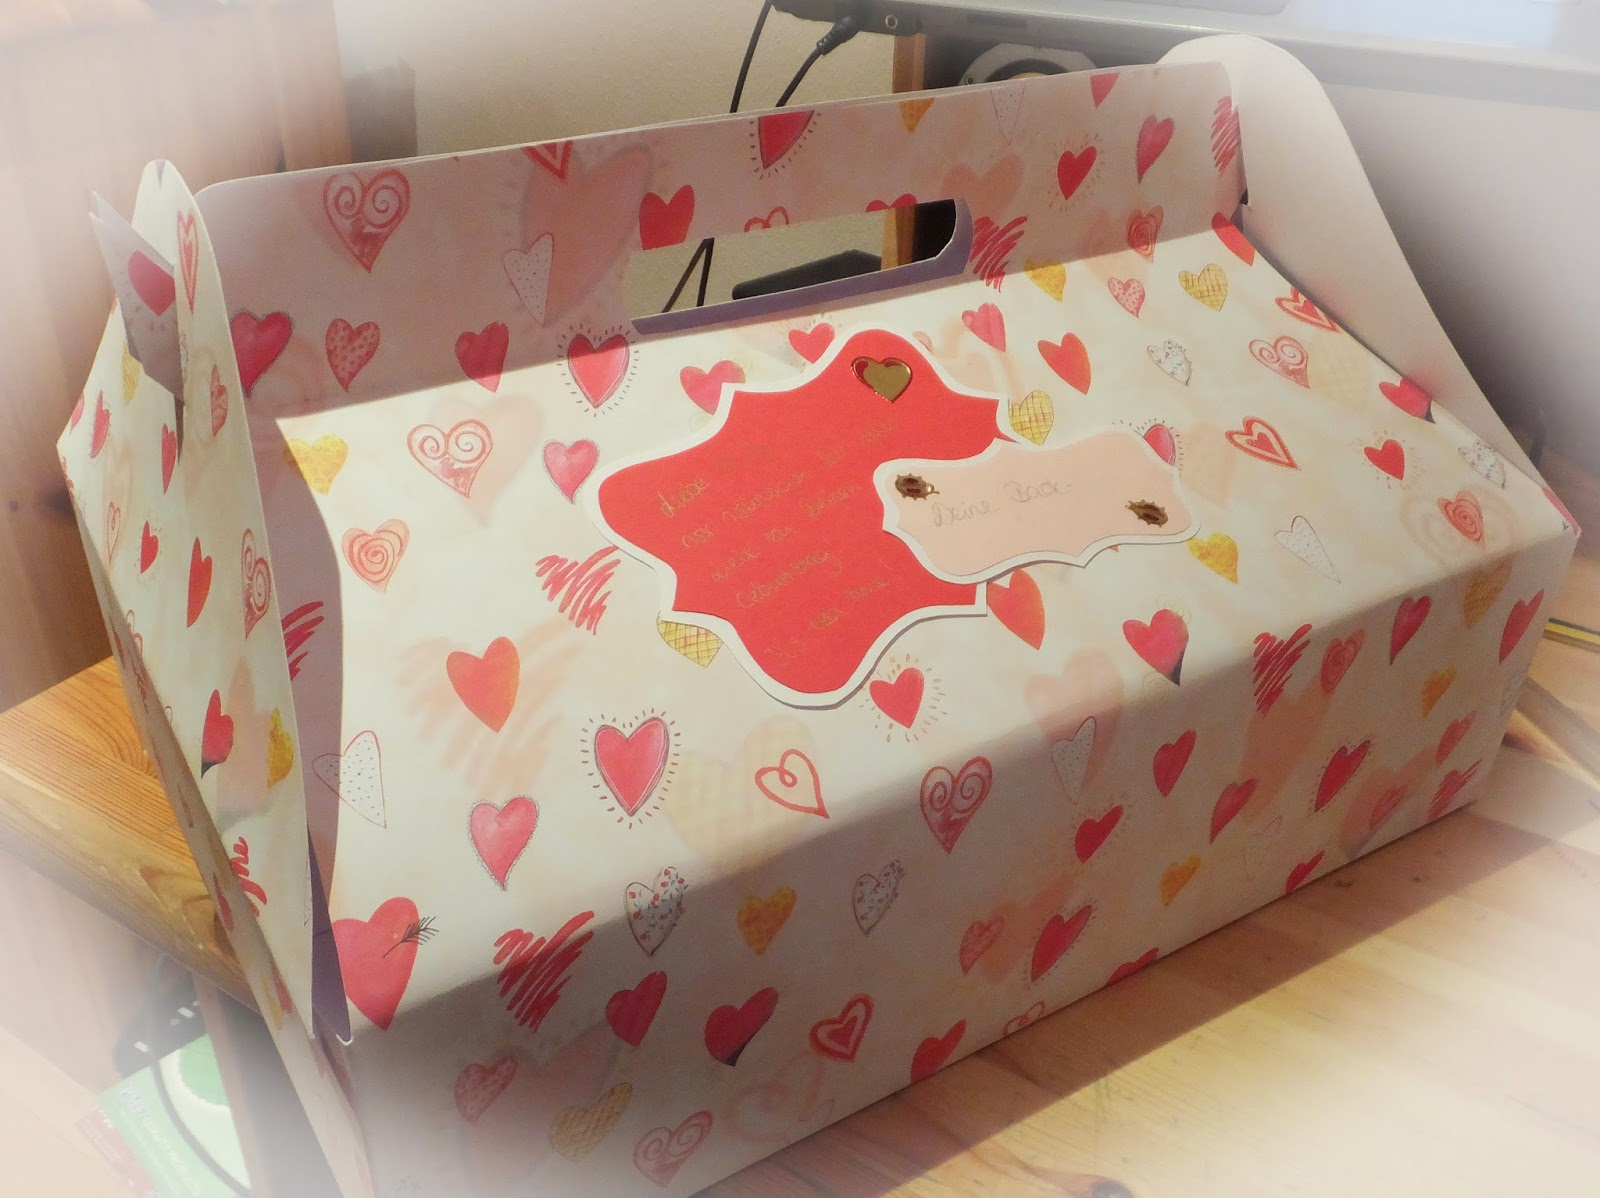 der gl ckliche sisyphus diy cupcake box f r 12 cupcakes. Black Bedroom Furniture Sets. Home Design Ideas